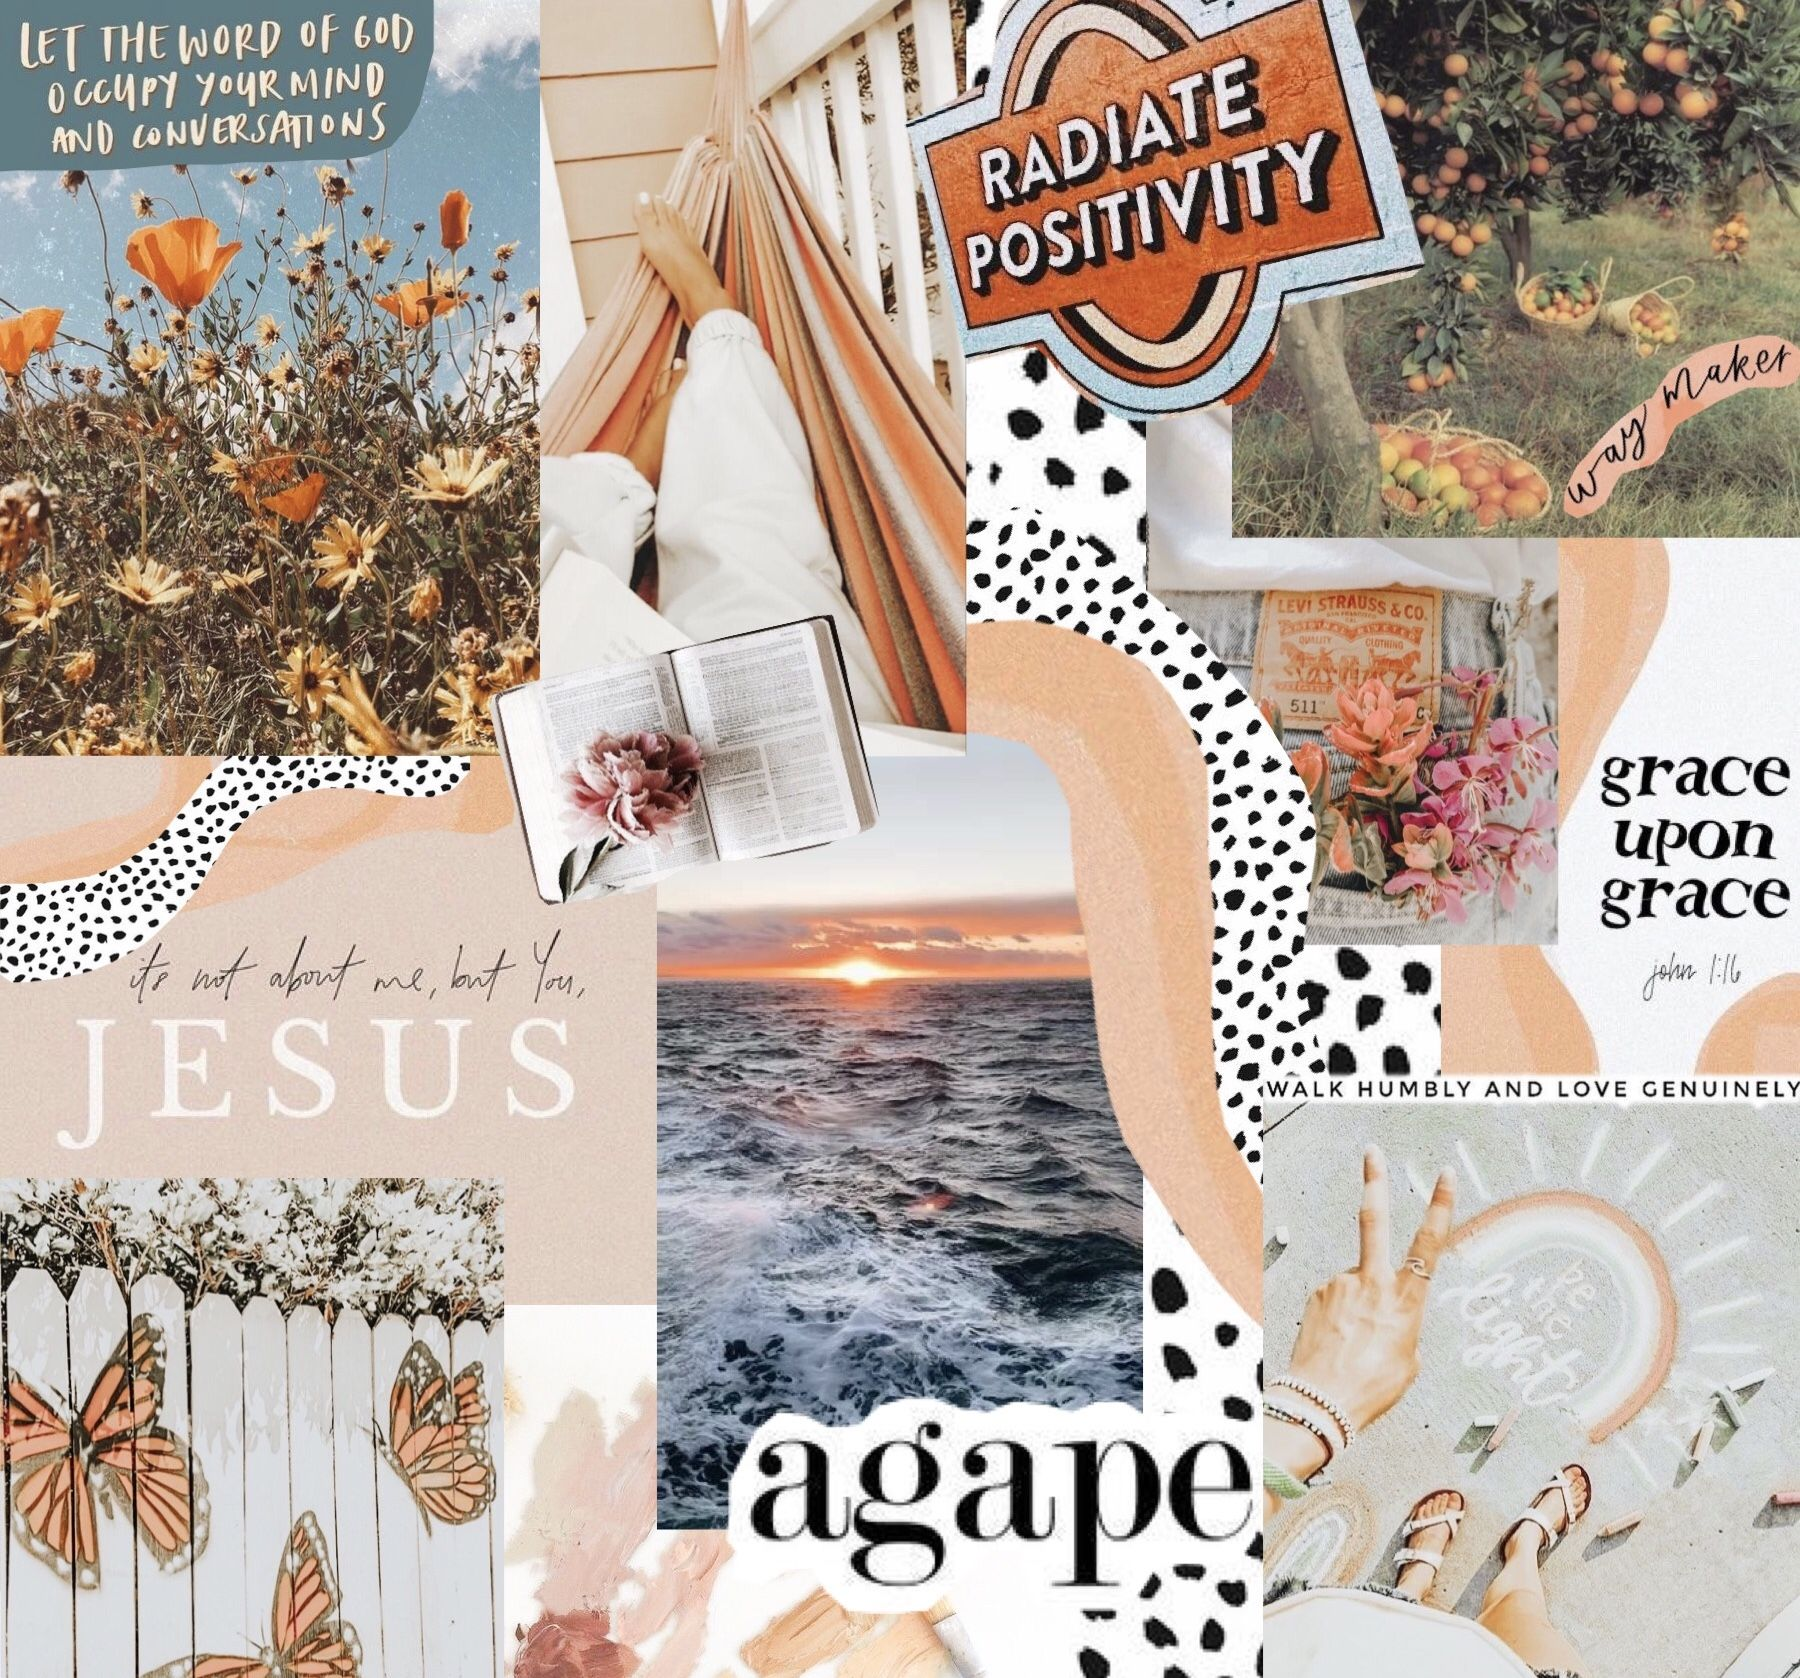 C R E A Te Jesus Wallpaper Cute Desktop Wallpaper College Wallpaper